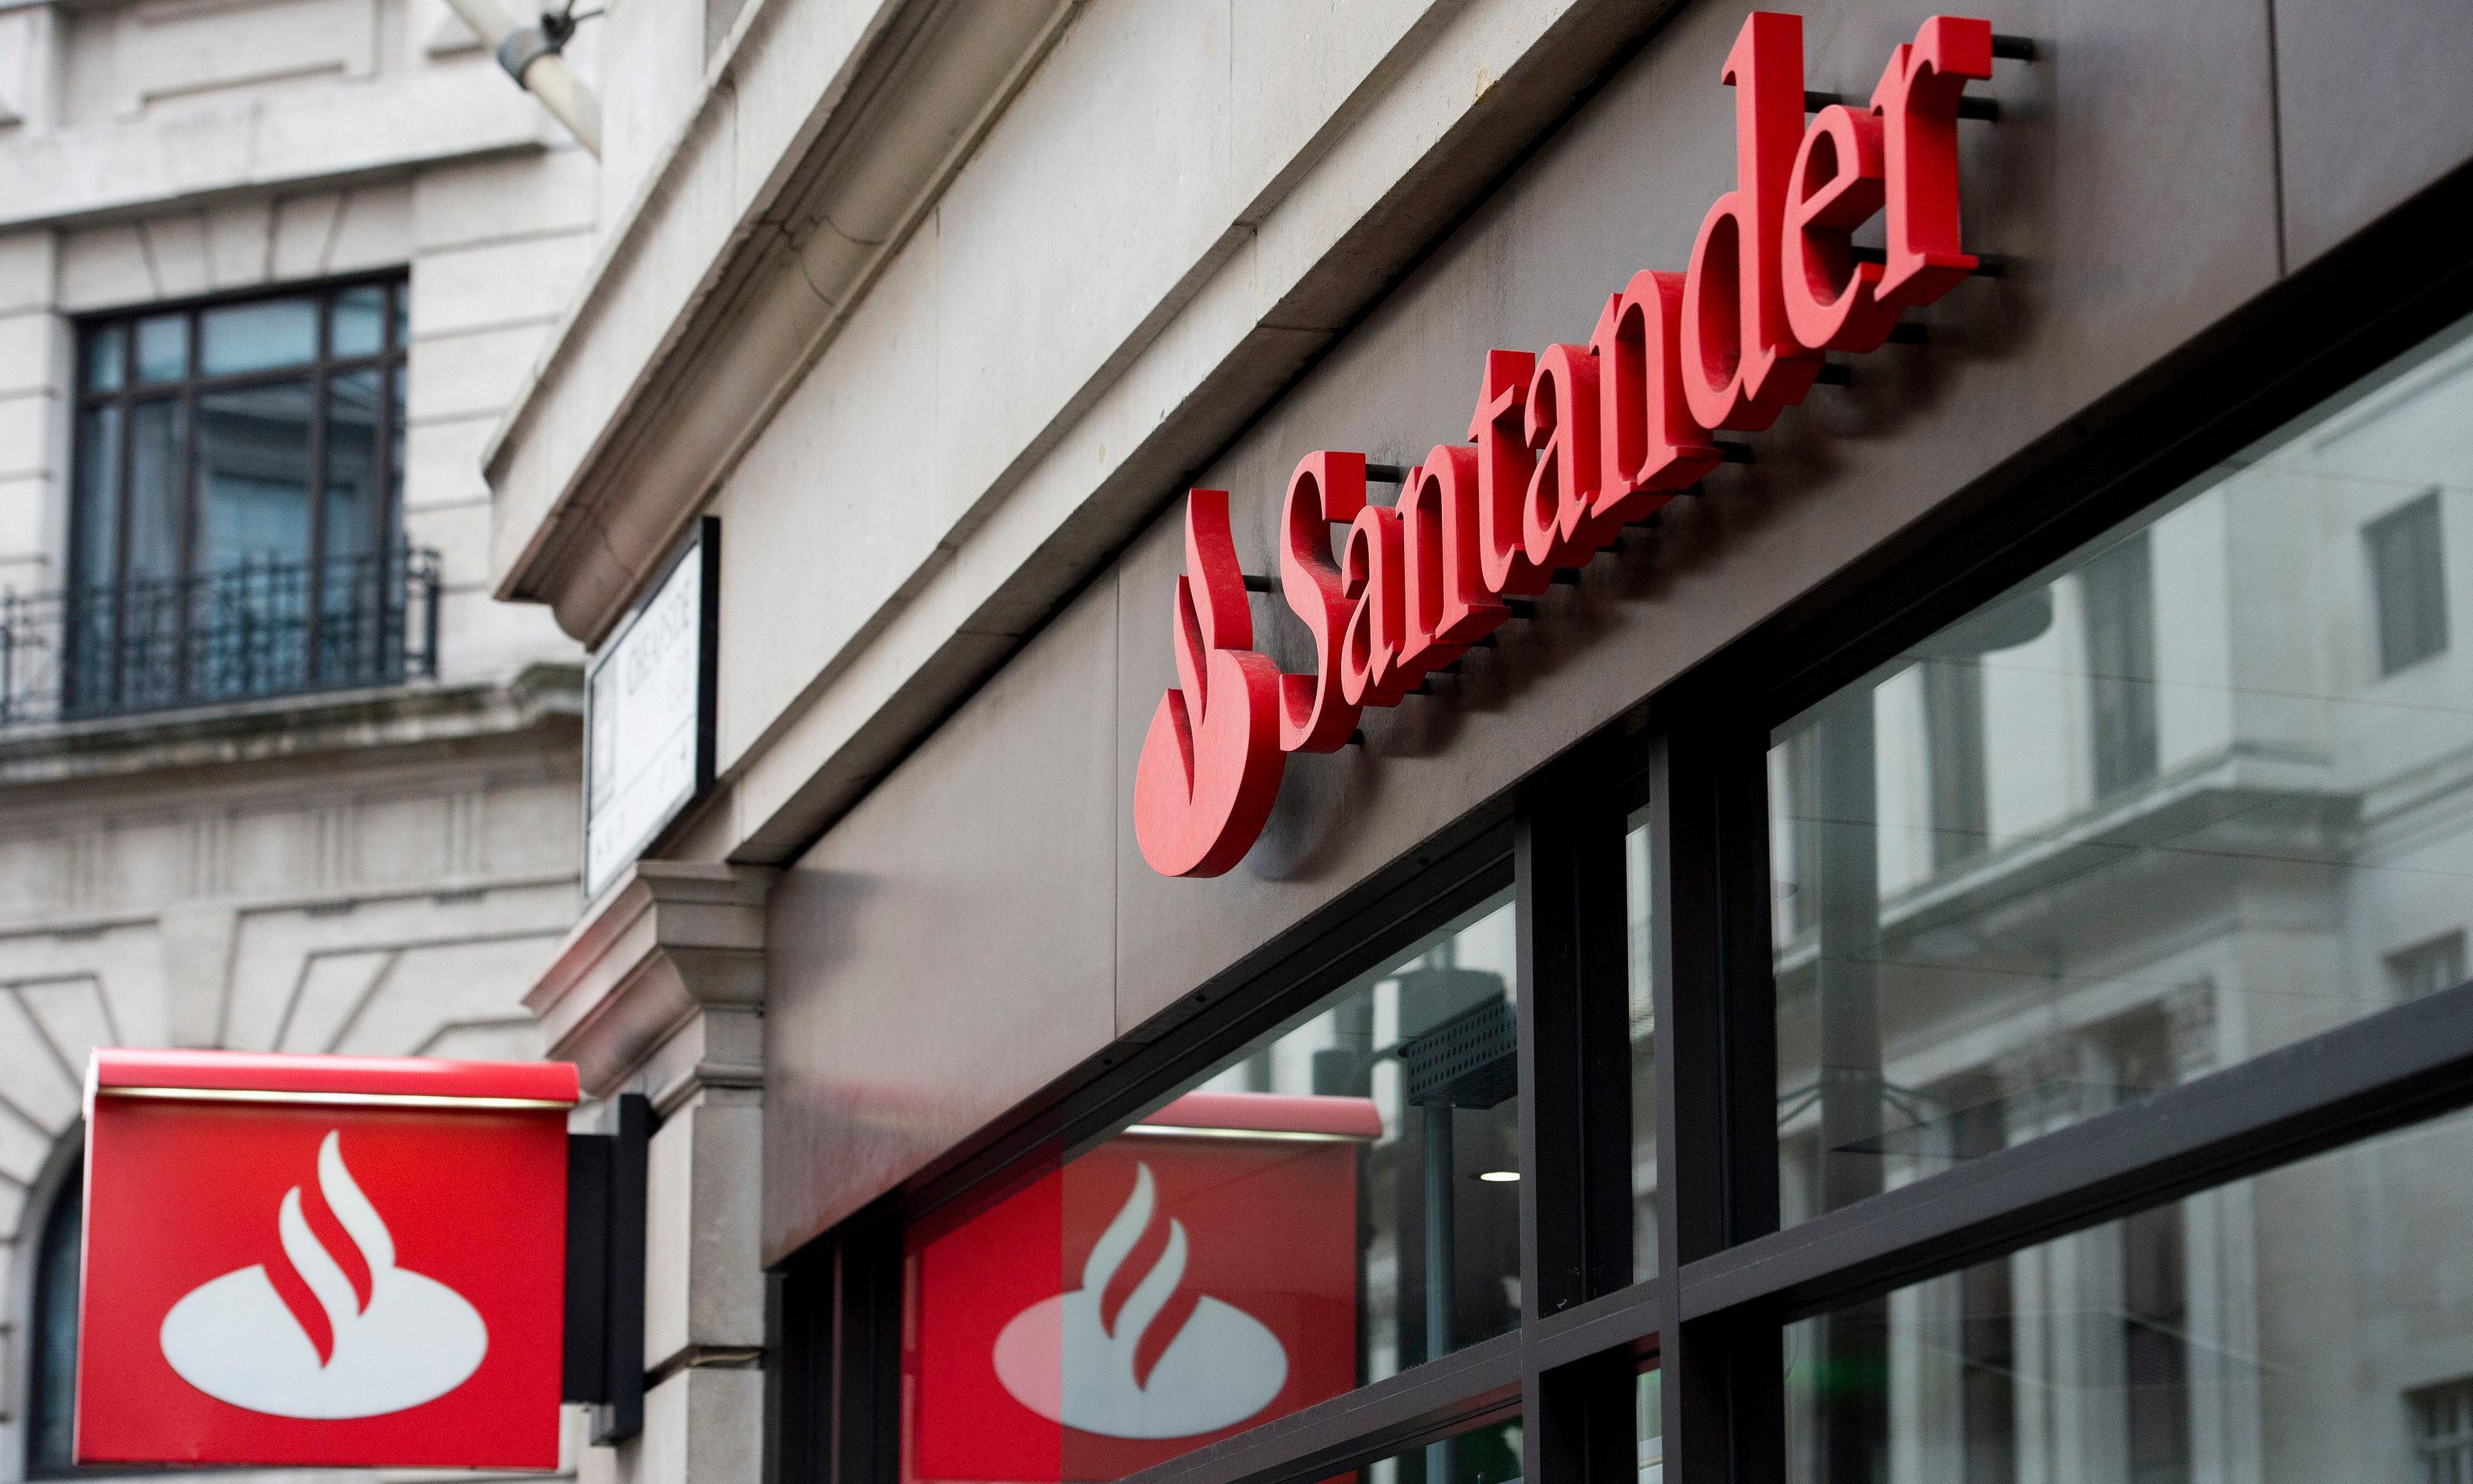 Santander extends PPI claims deadline after IT problems